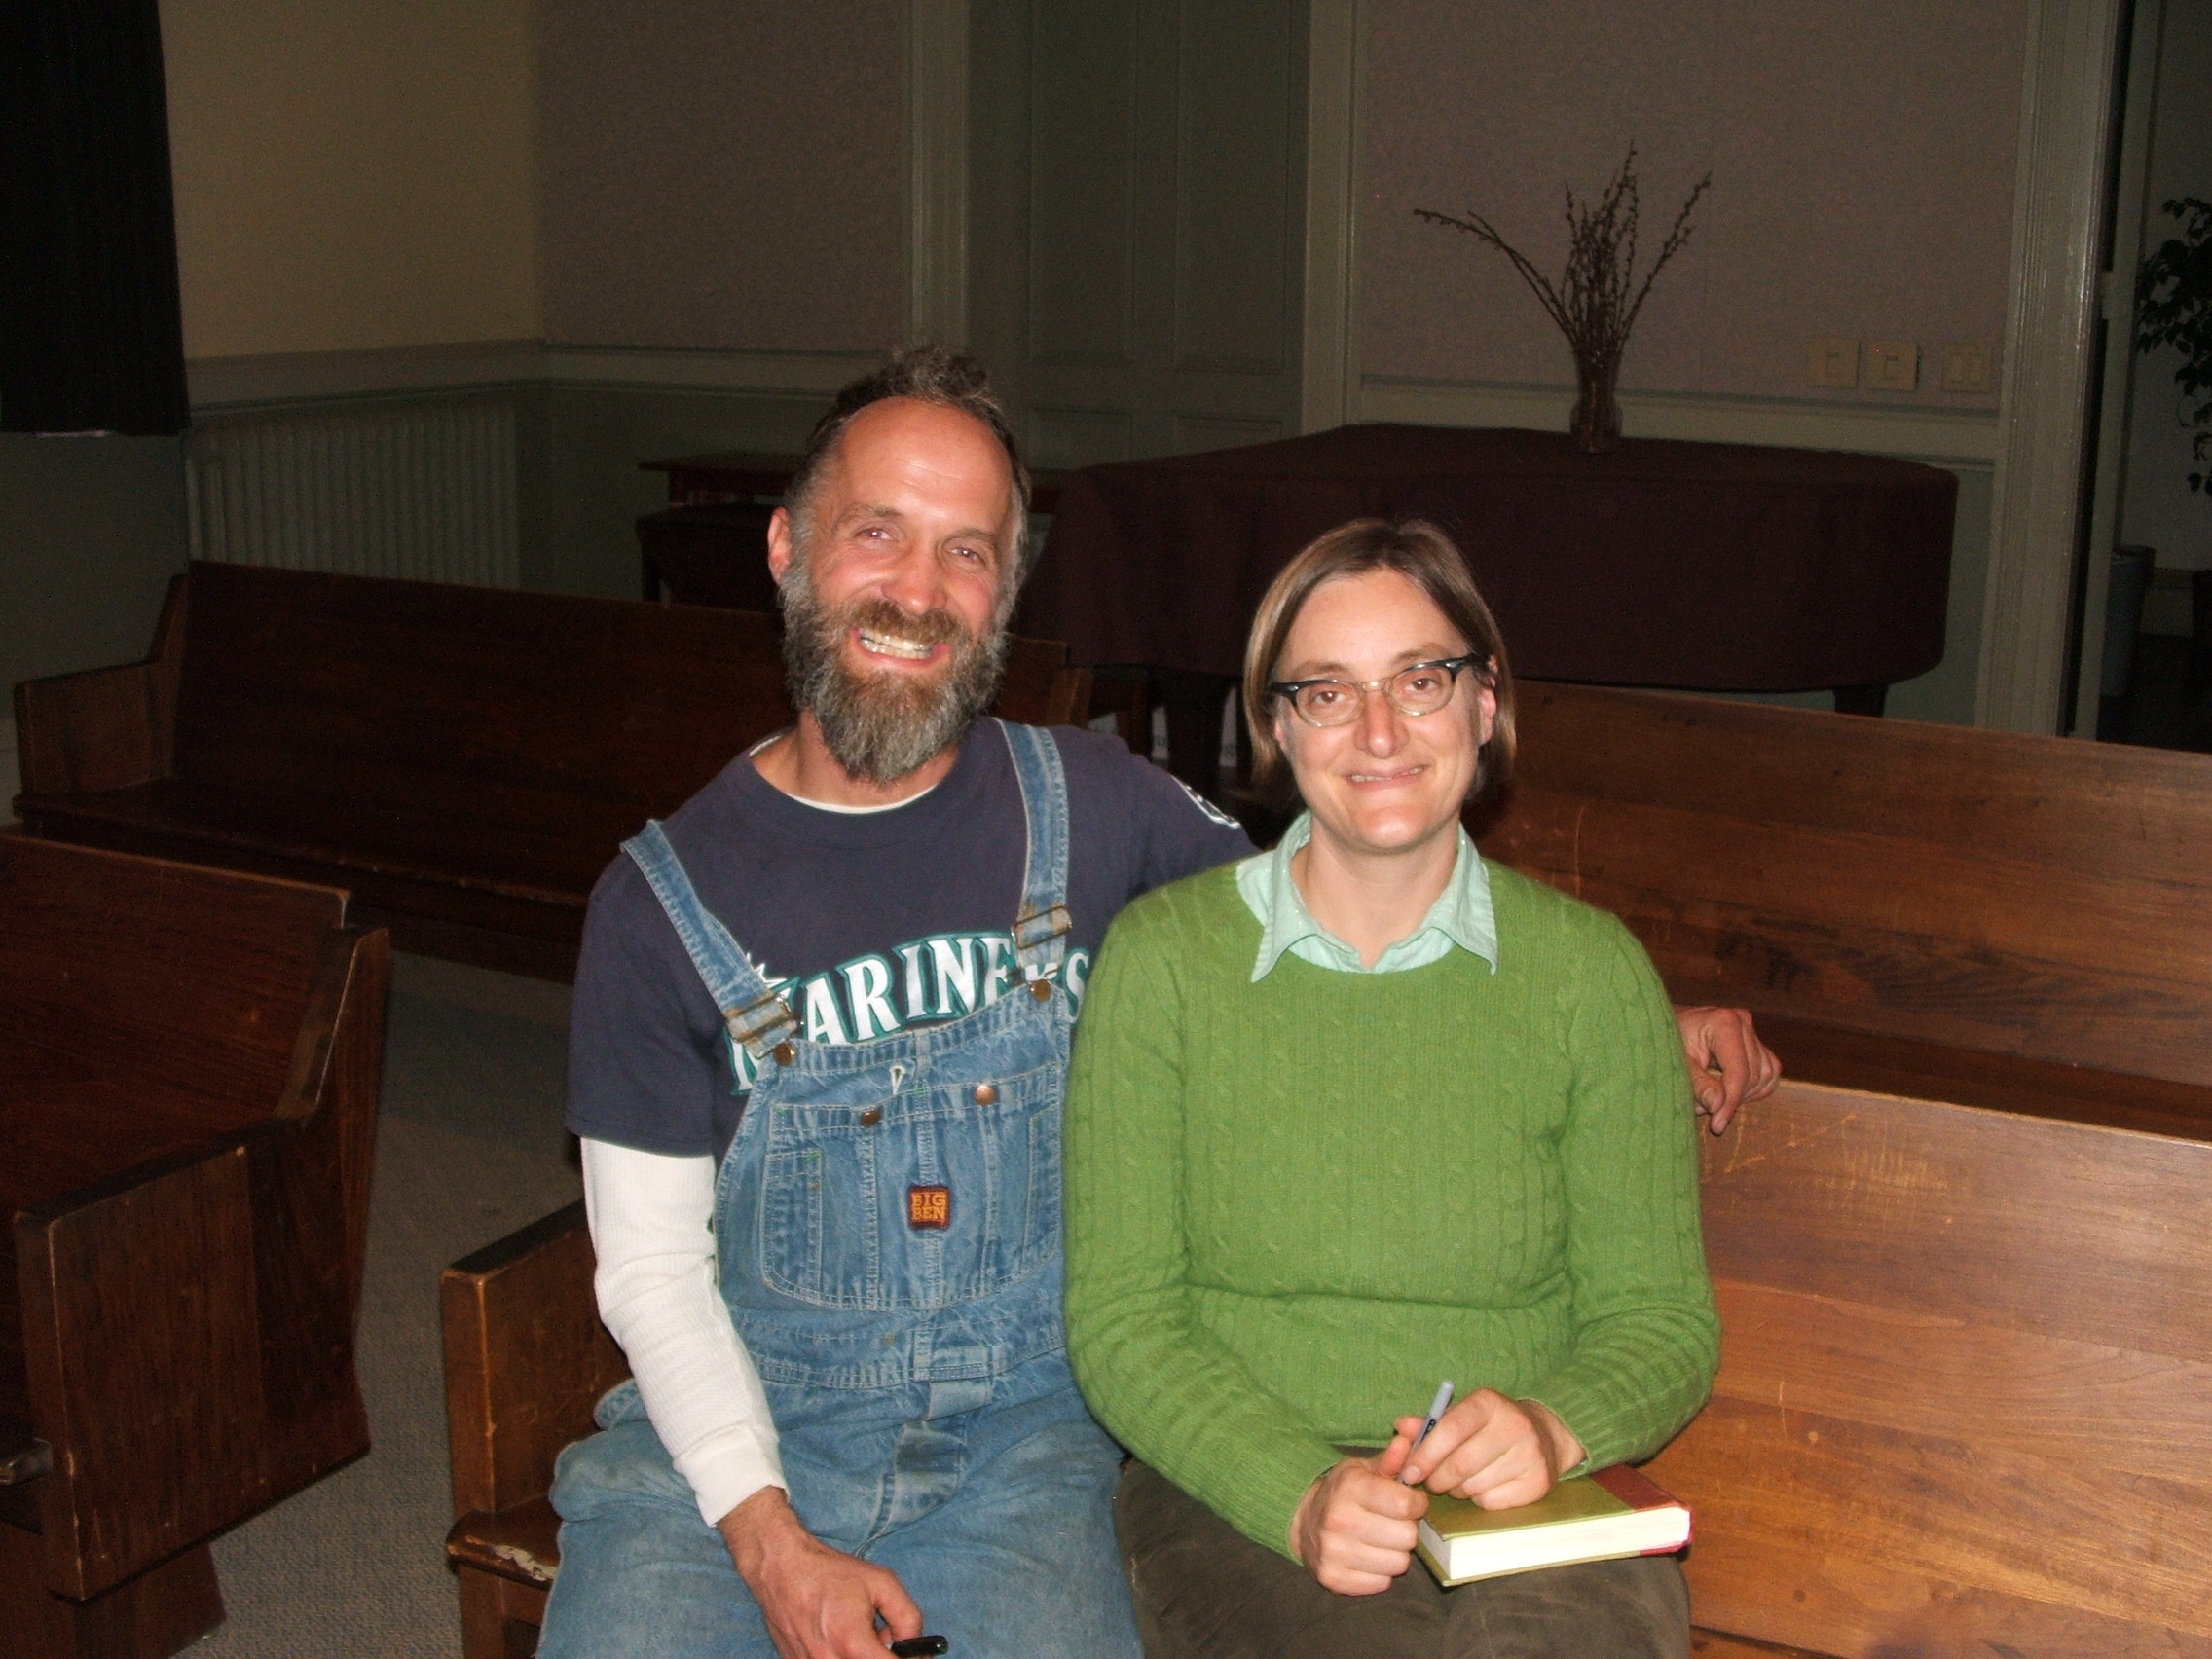 Novella Carpenter oakland 'farm' | Food Freedom